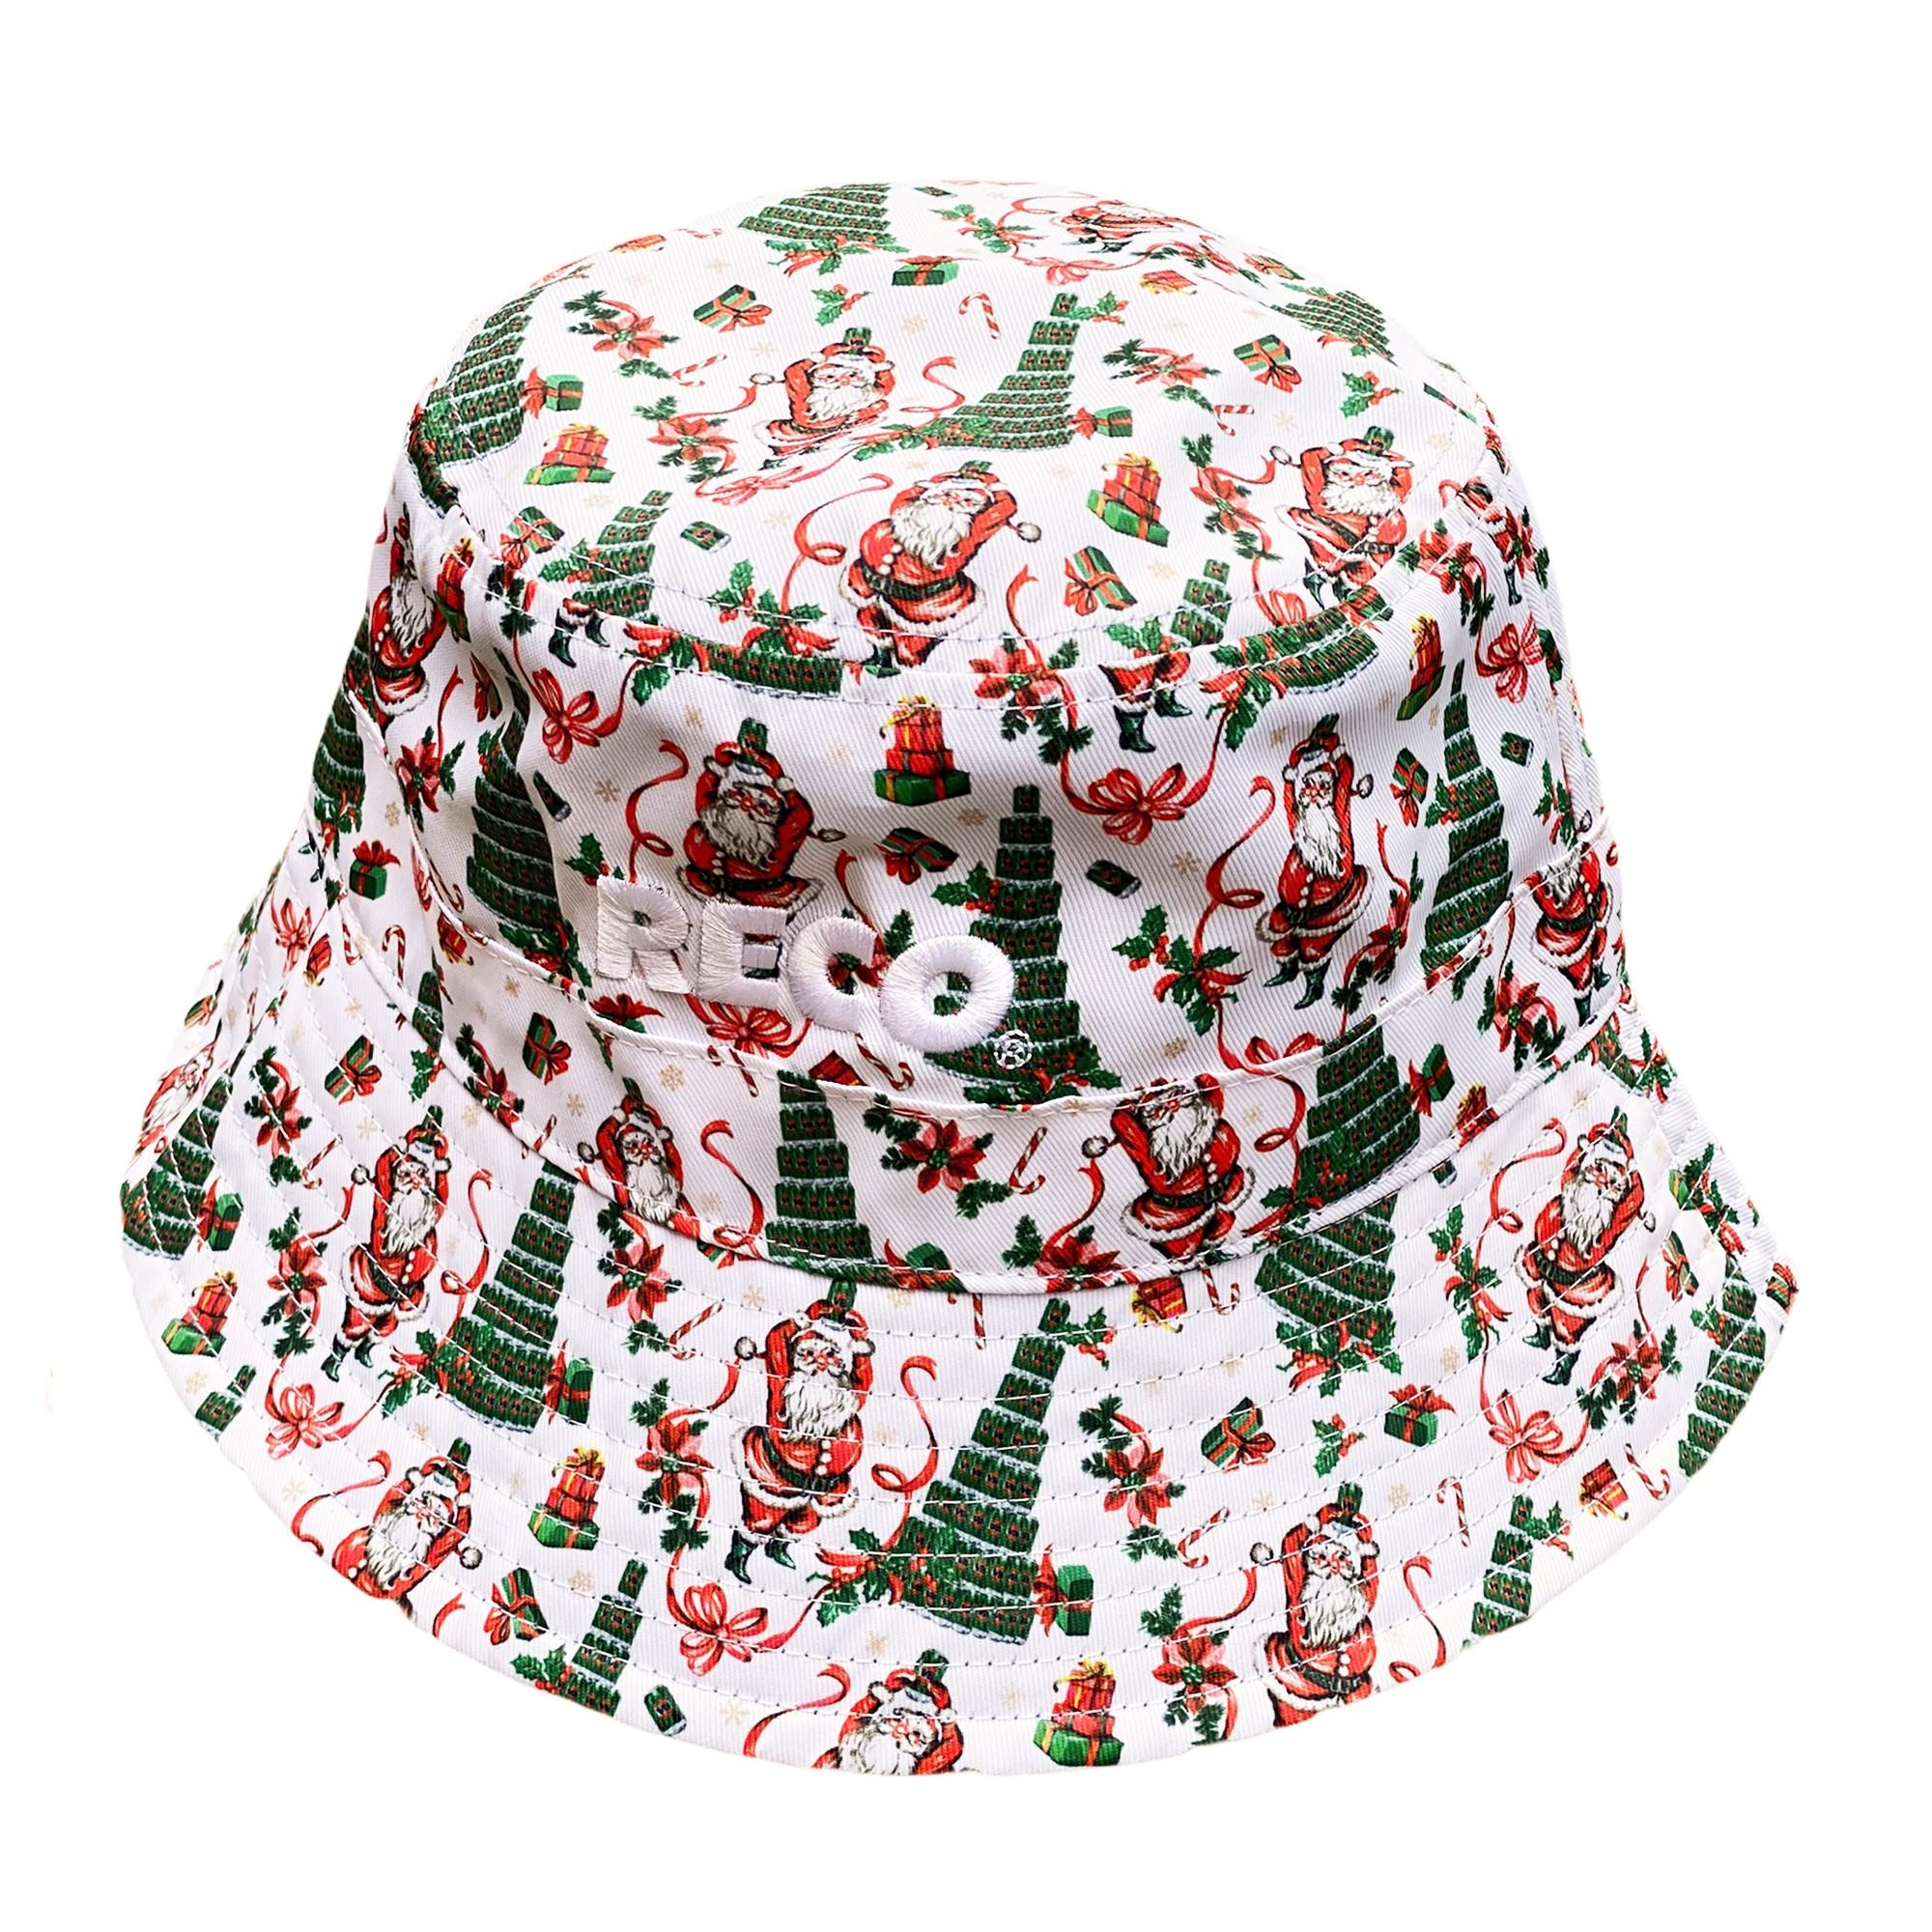 TINNIES XMAS TREE BUCKET HAT